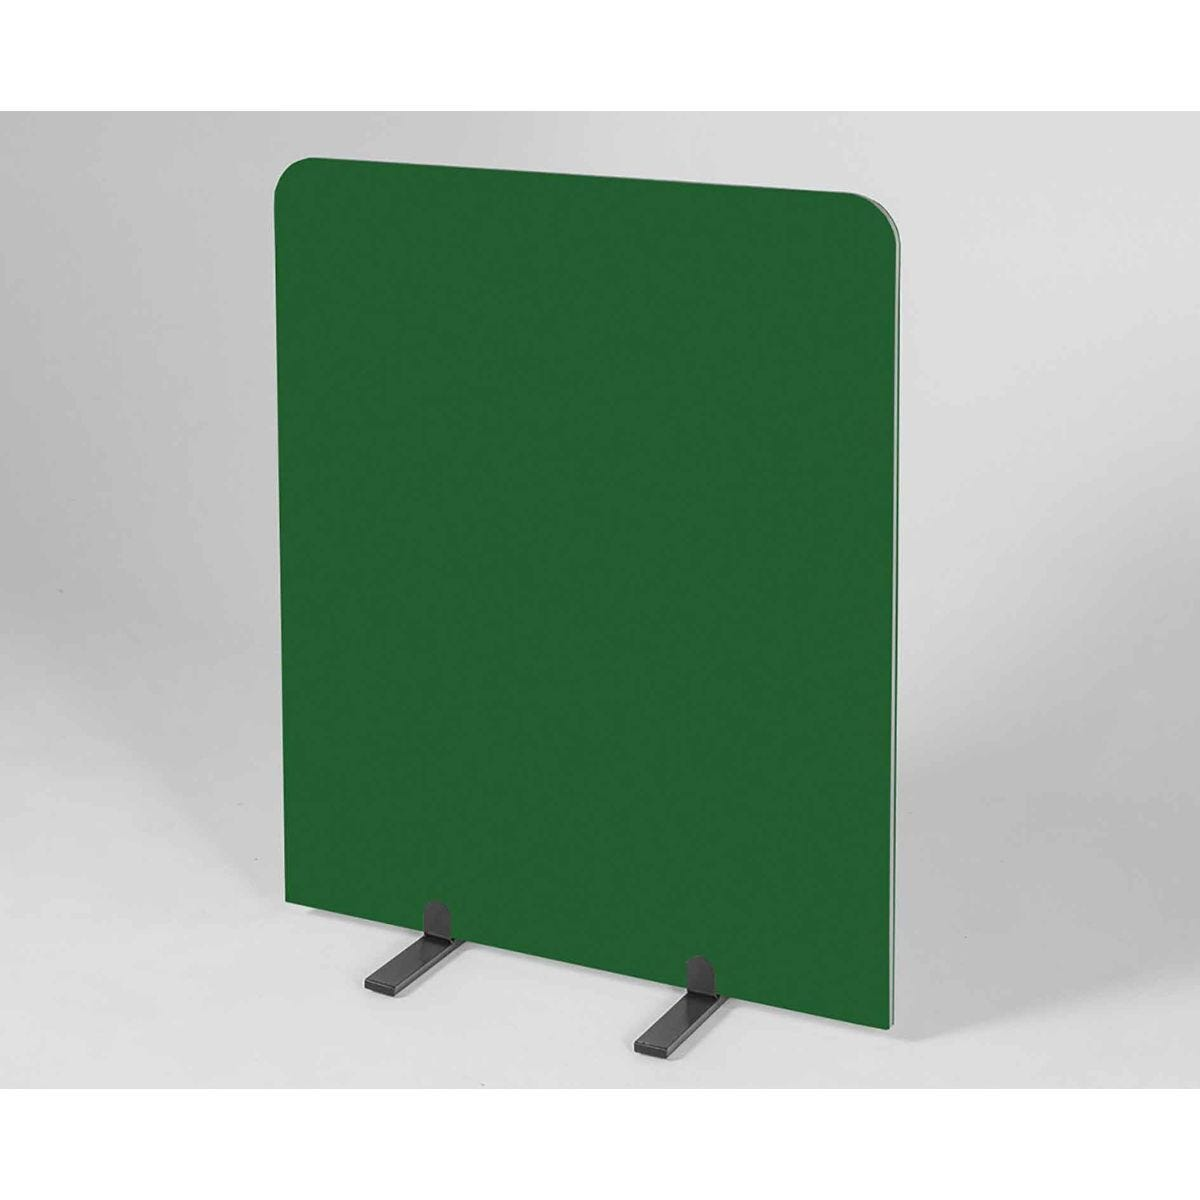 Metroplan BusyScreen Curve Screen 1600 x 1200mm Emerald